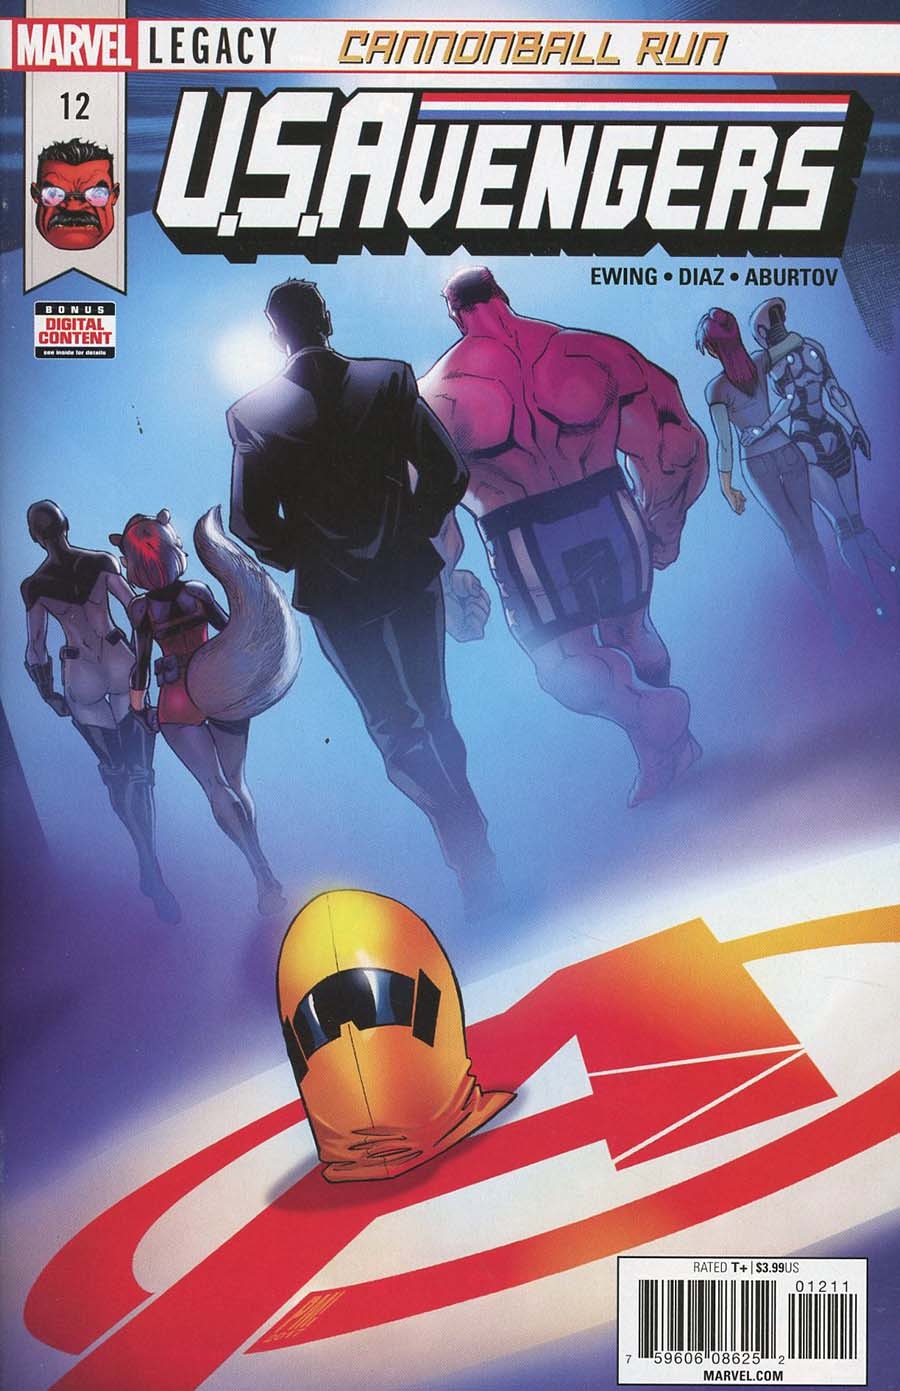 U.S.Avengers #12 (Marvel Legacy Tie-In)